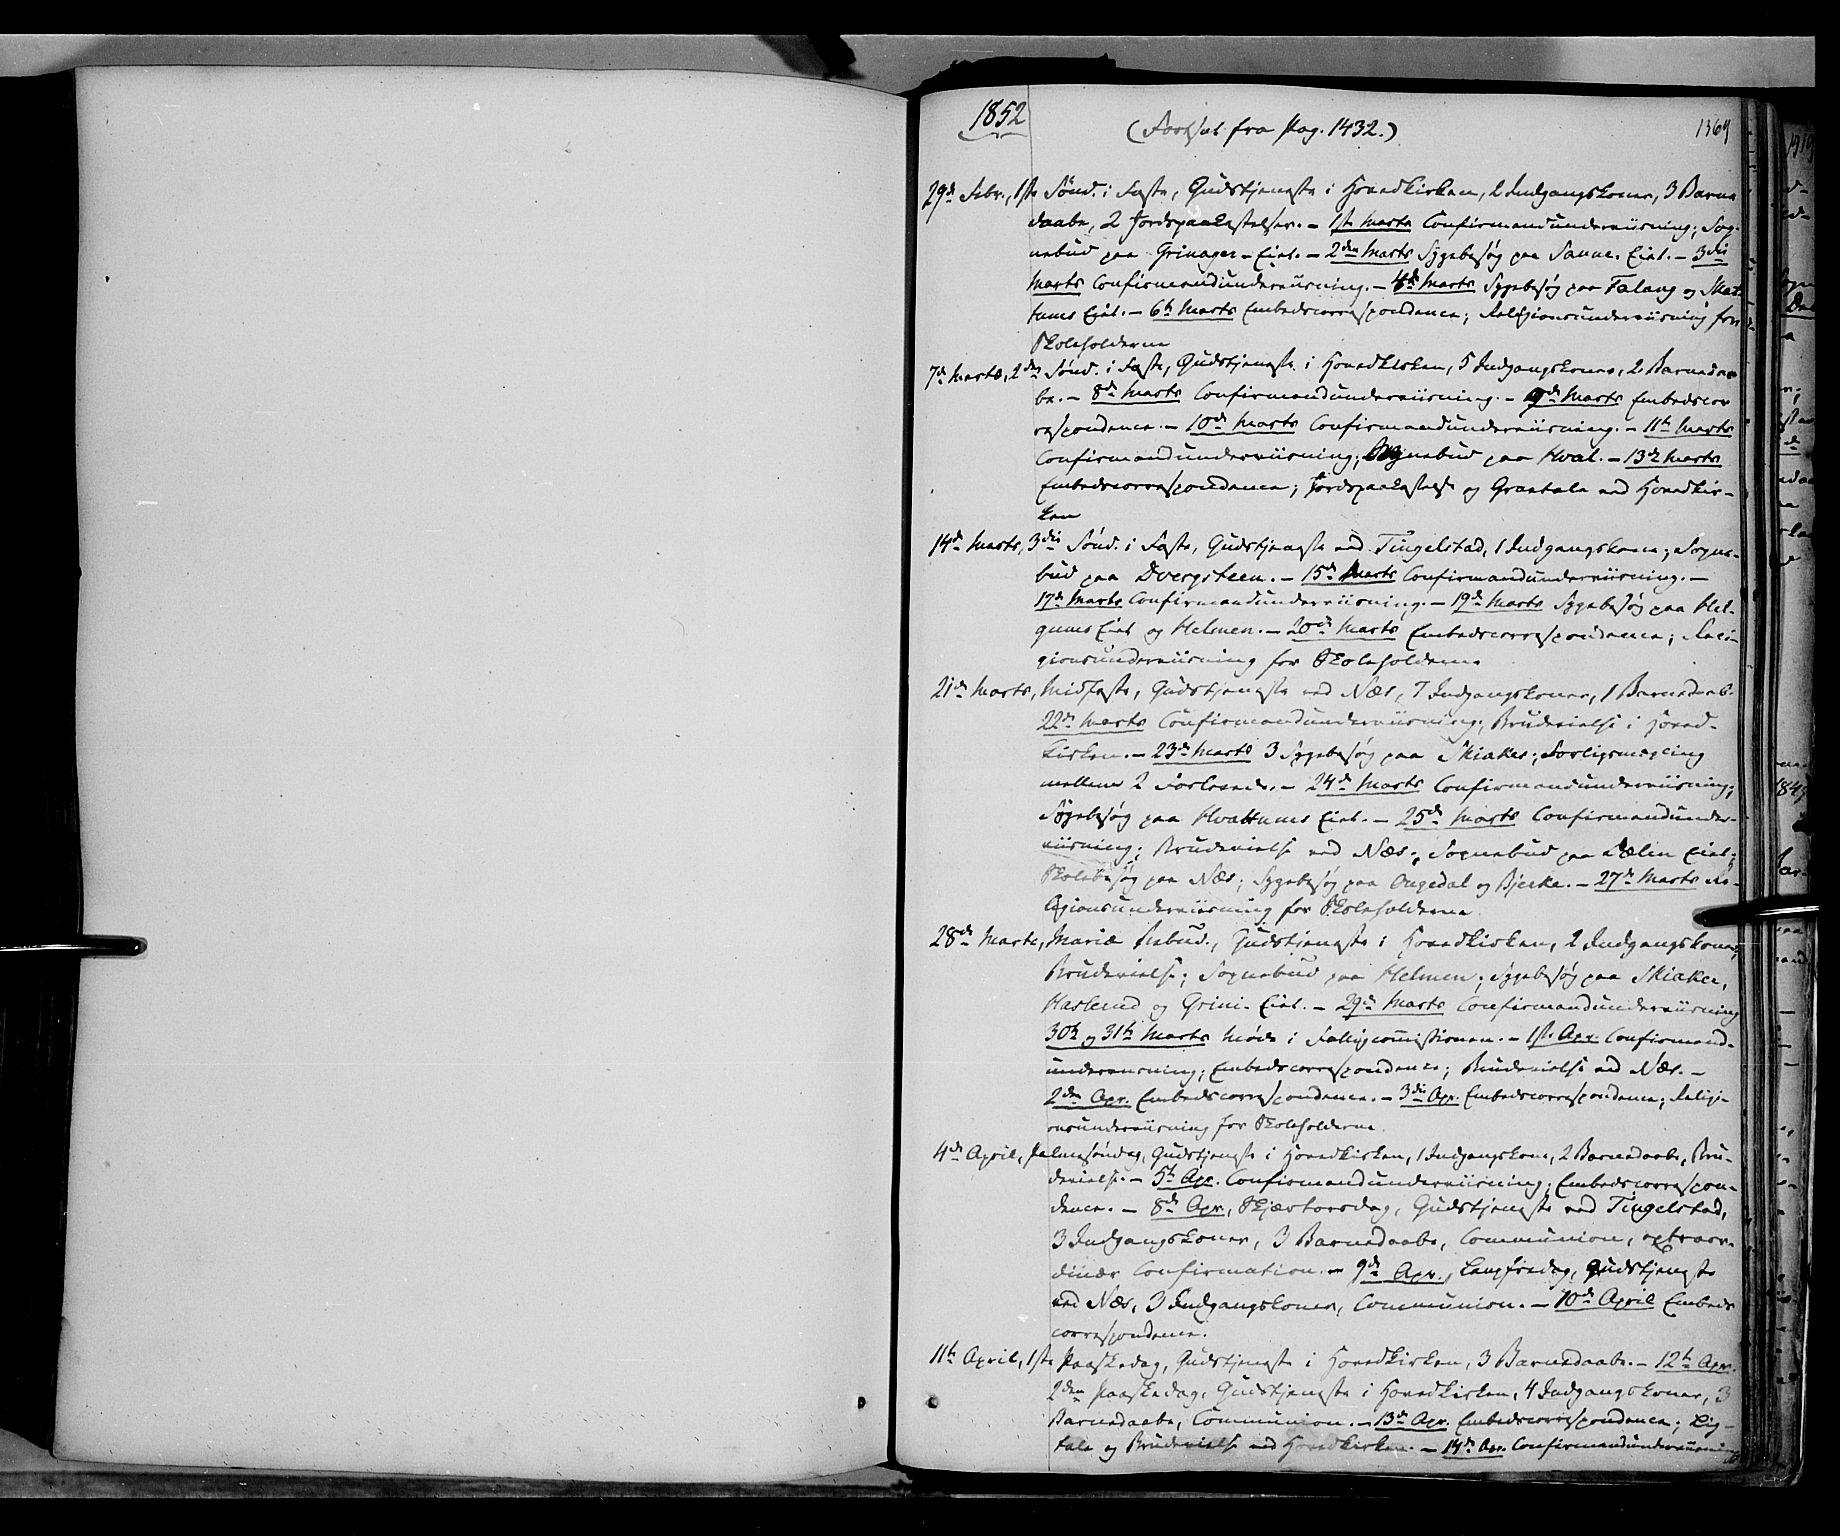 SAH, Gran prestekontor, Ministerialbok nr. 11, 1842-1856, s. 1368-1369